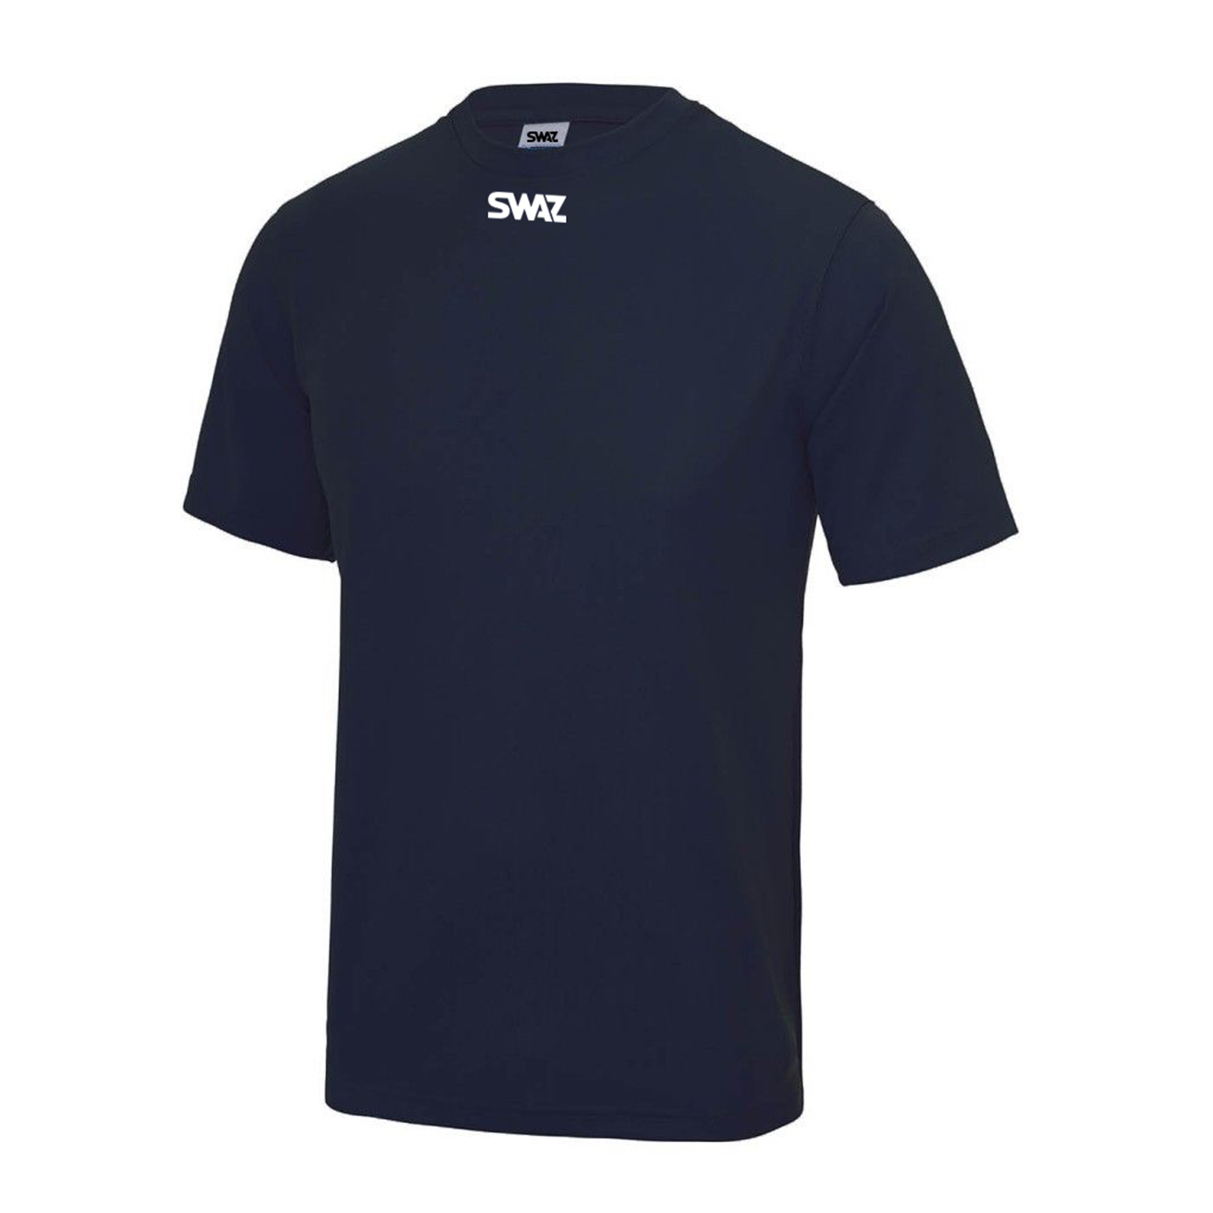 SWAZ Club Training T-Shirt – Navy